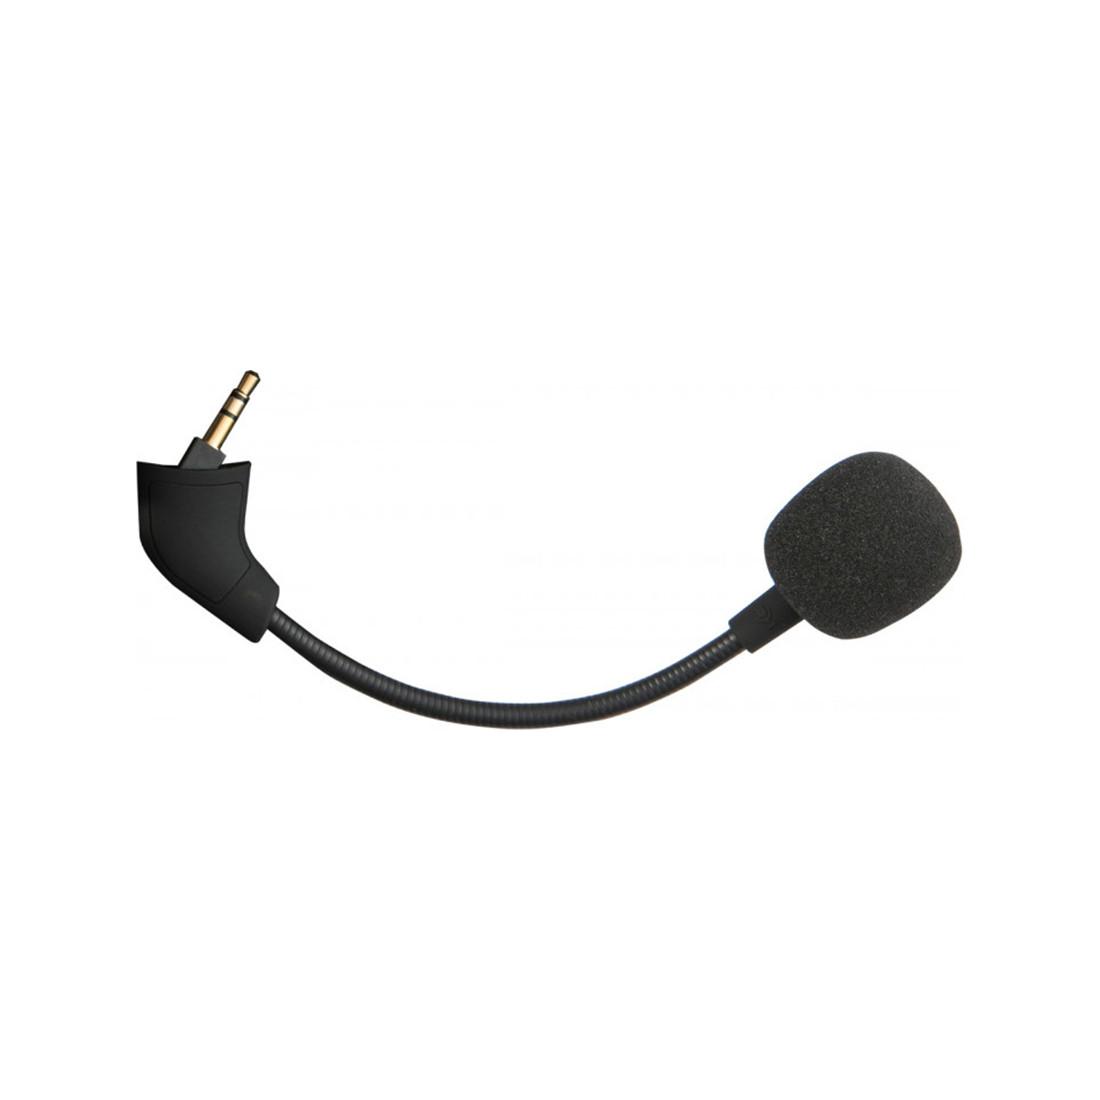 Микрофон для гарнитур Cloud II HyperX HXS-HSMC1 (Black)